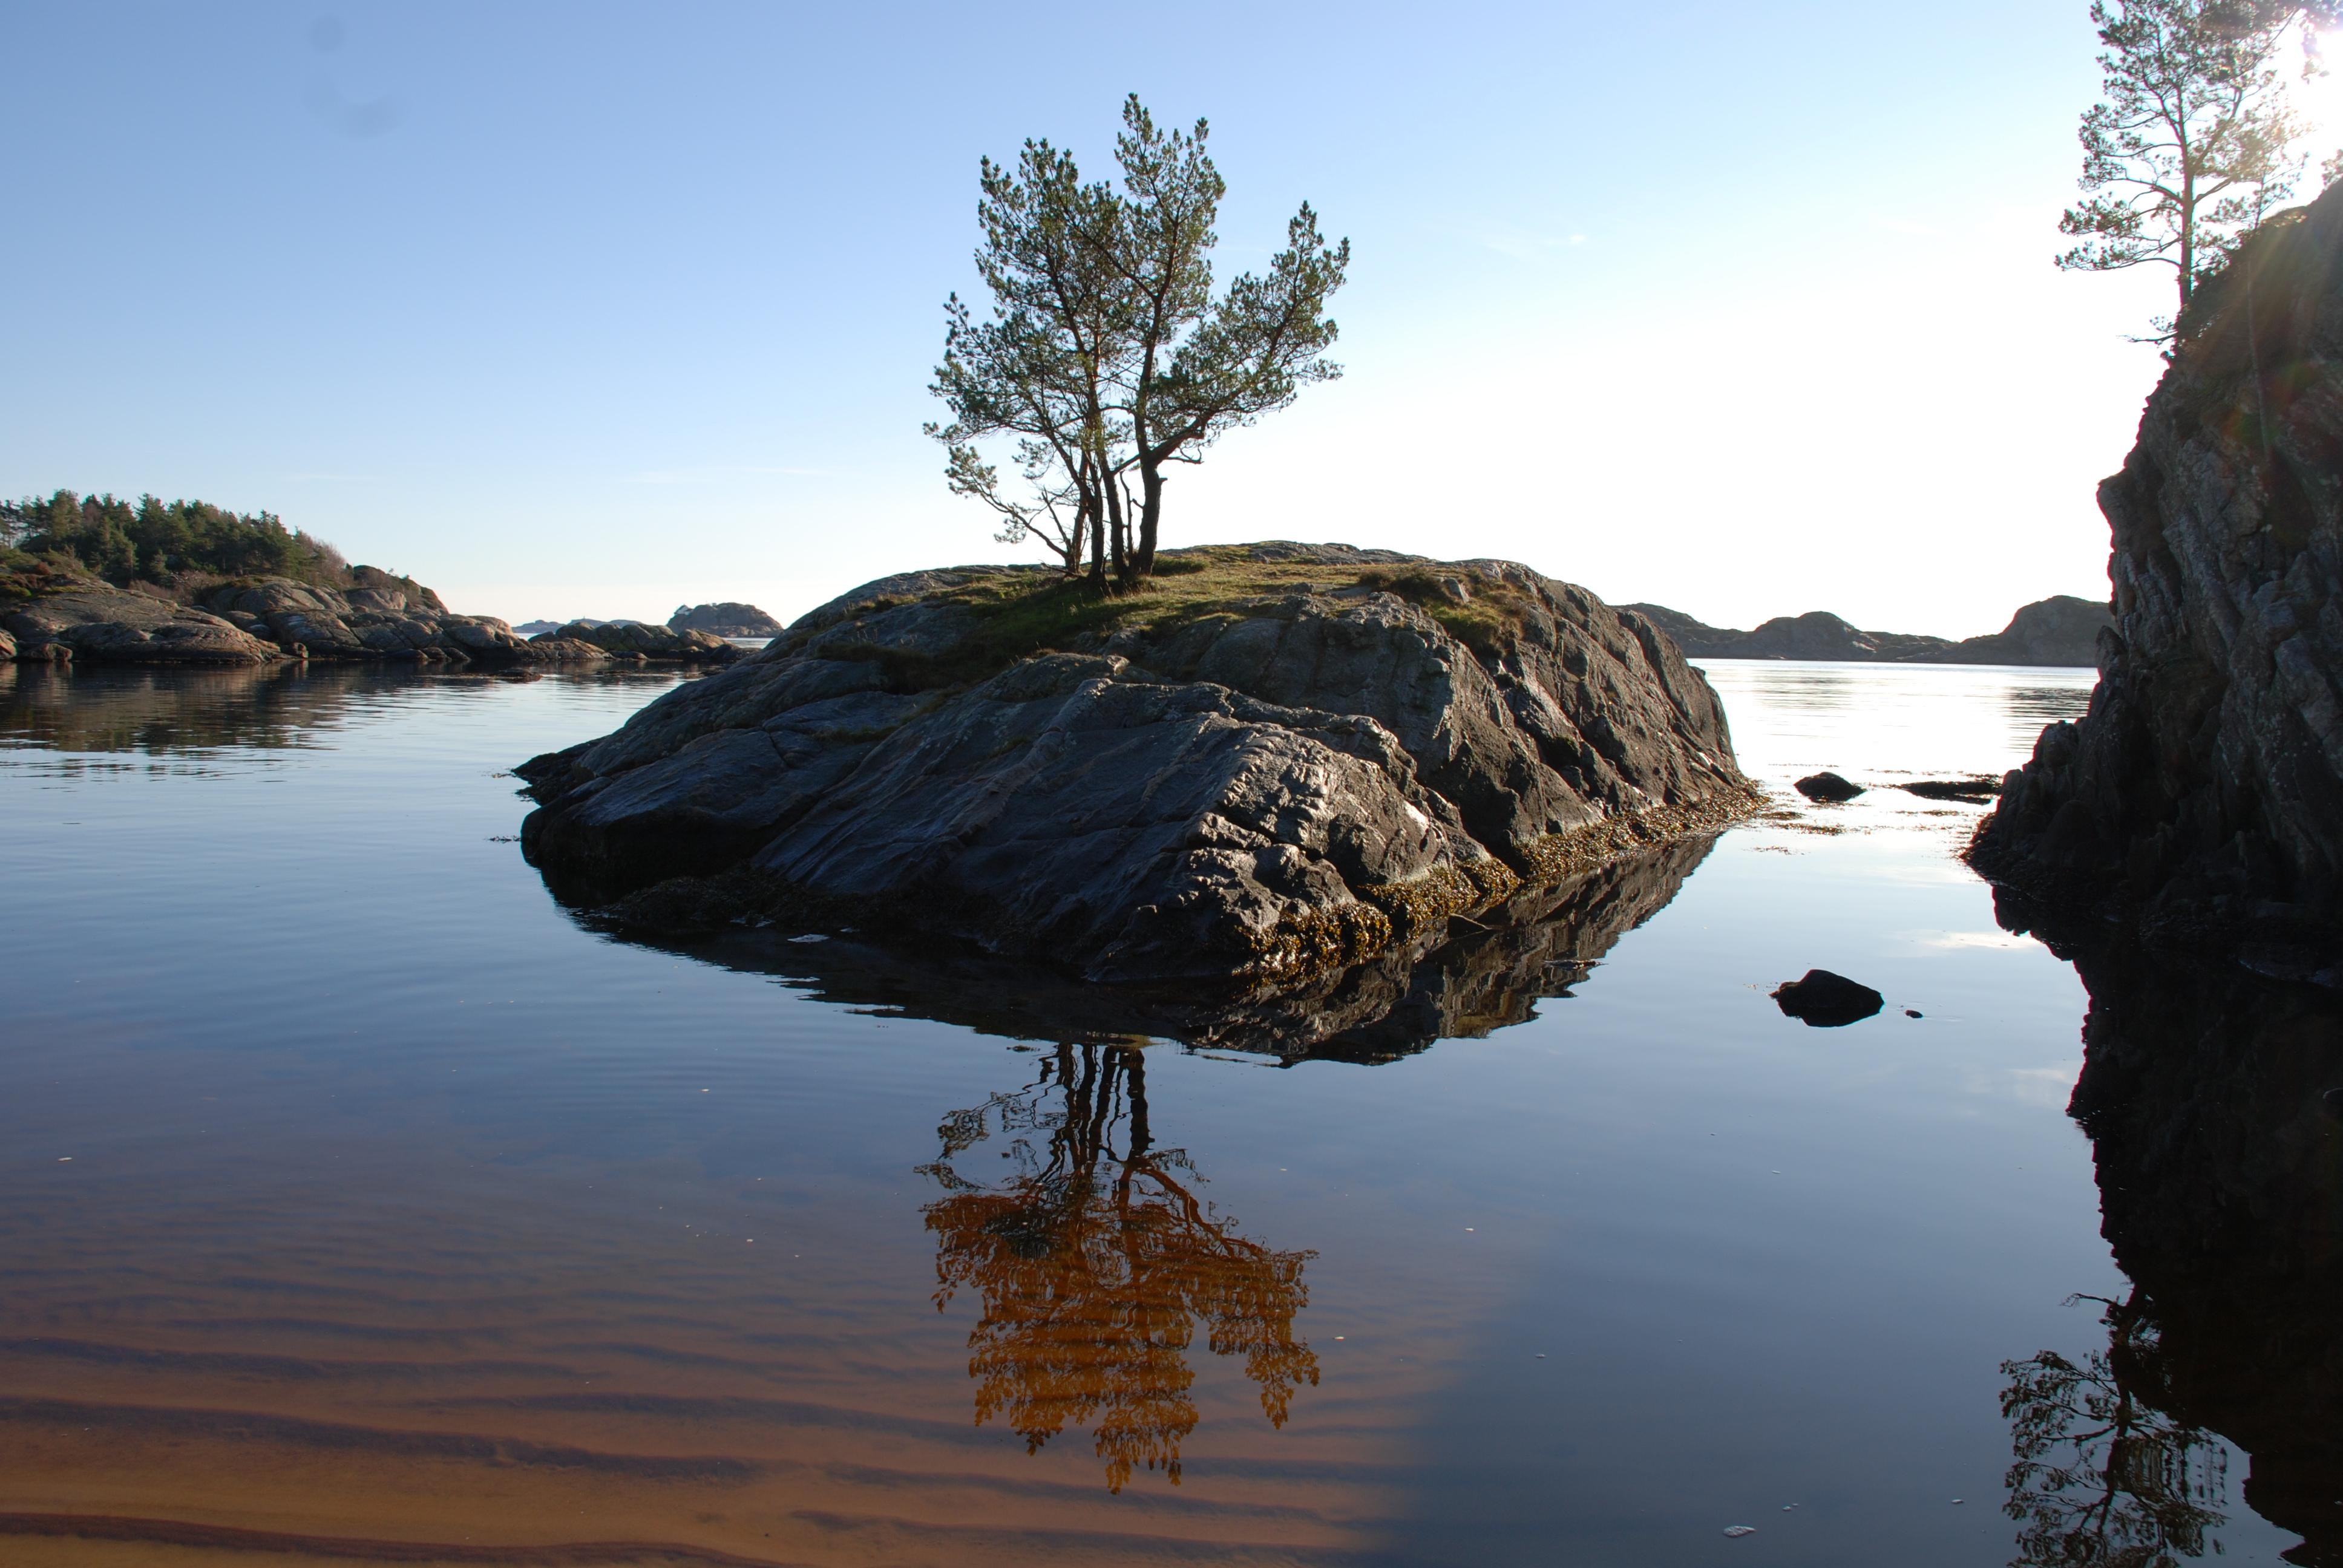 norske bilder bilder